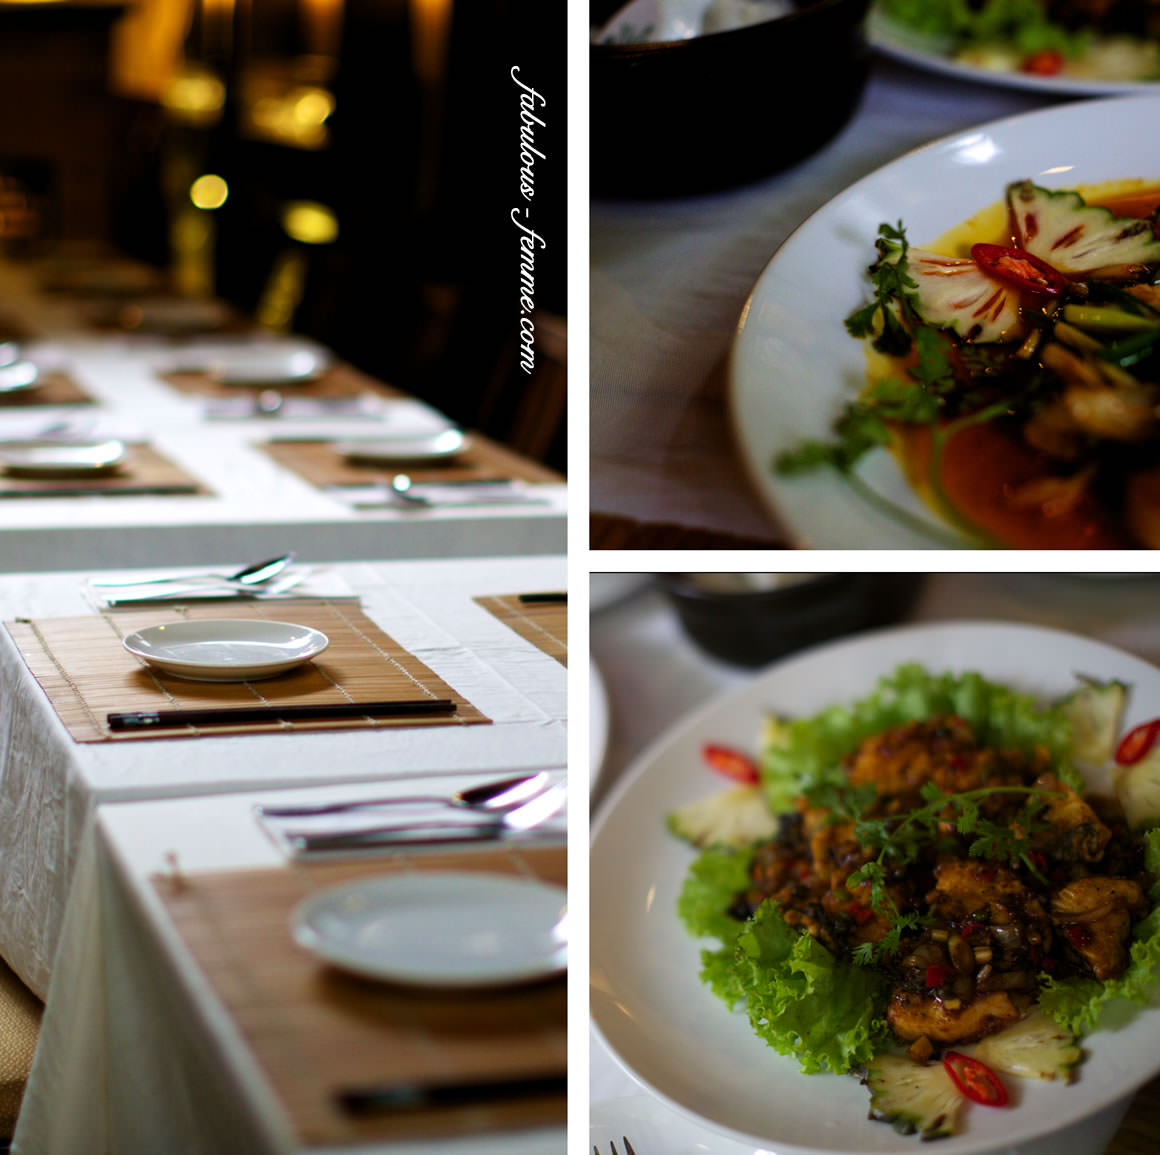 traditinonal vietnamese meals